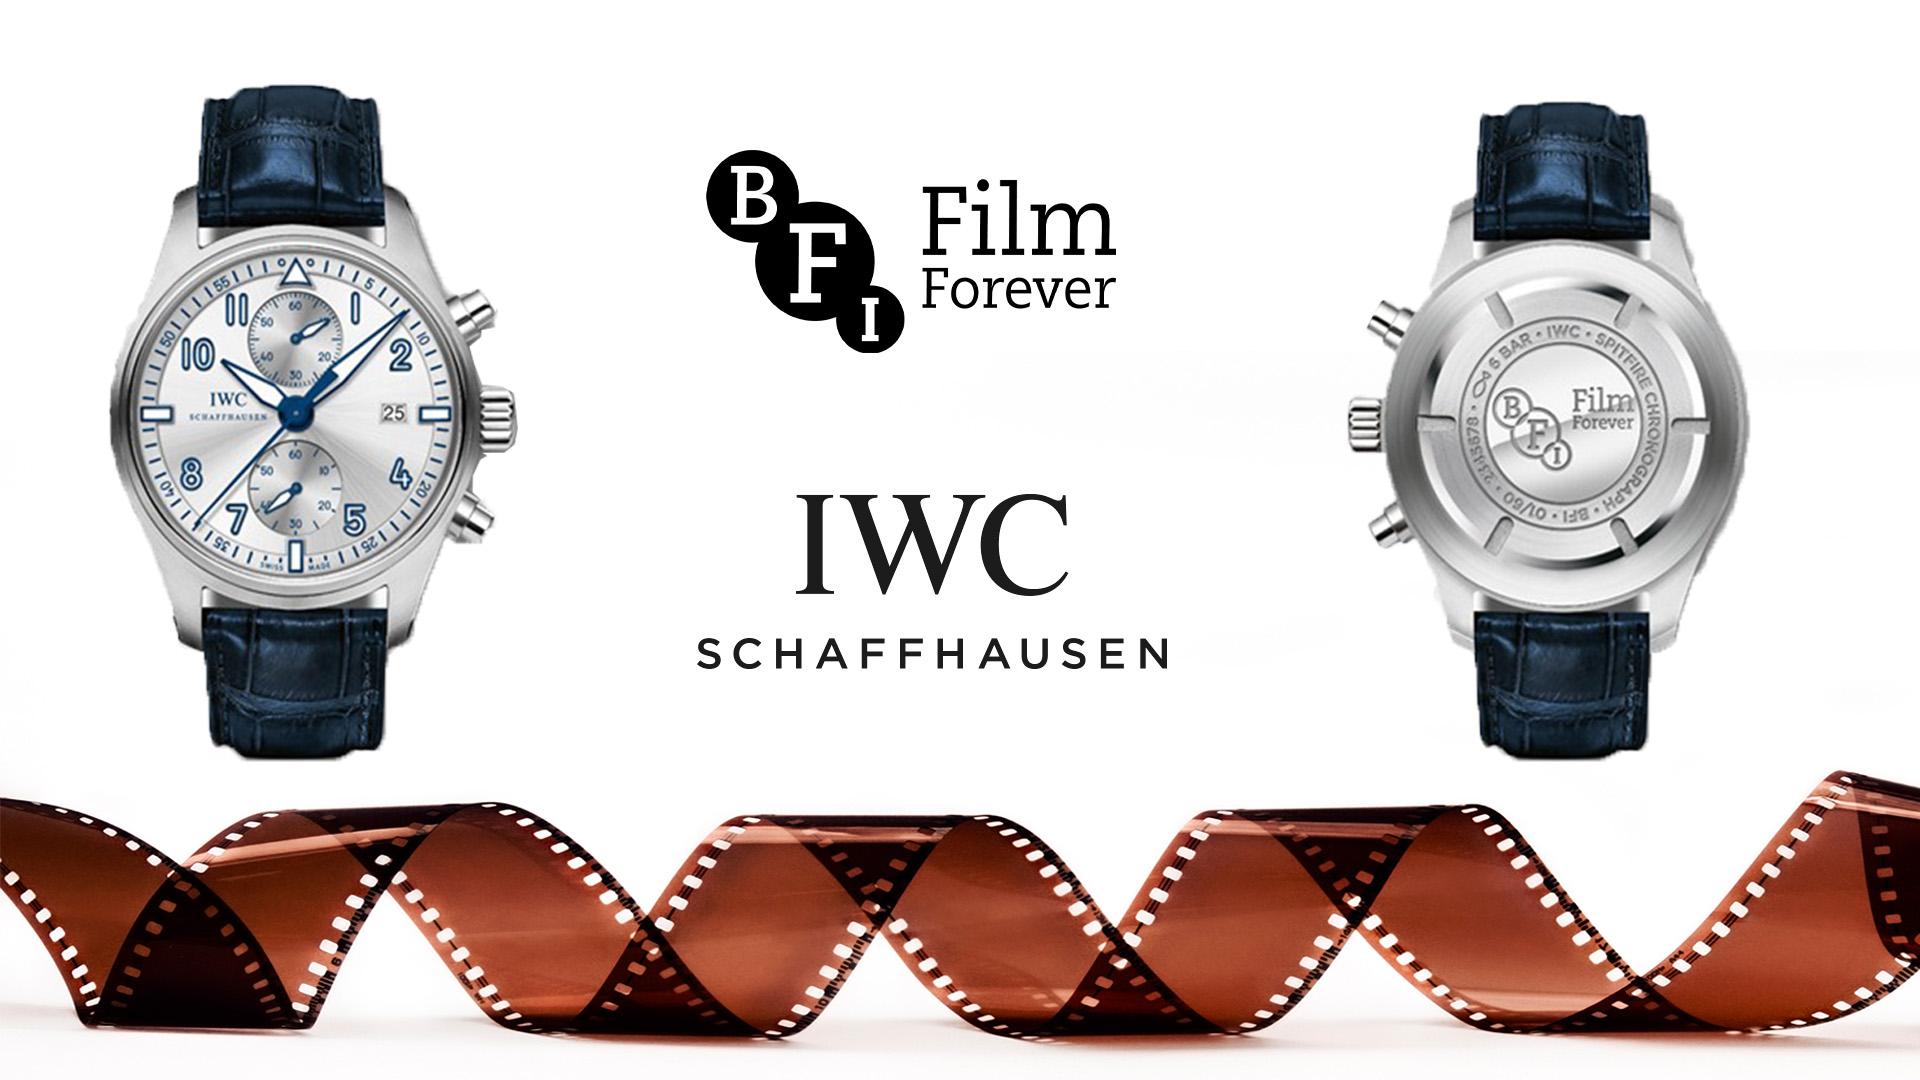 iwc-slider-bfi-film.jpg